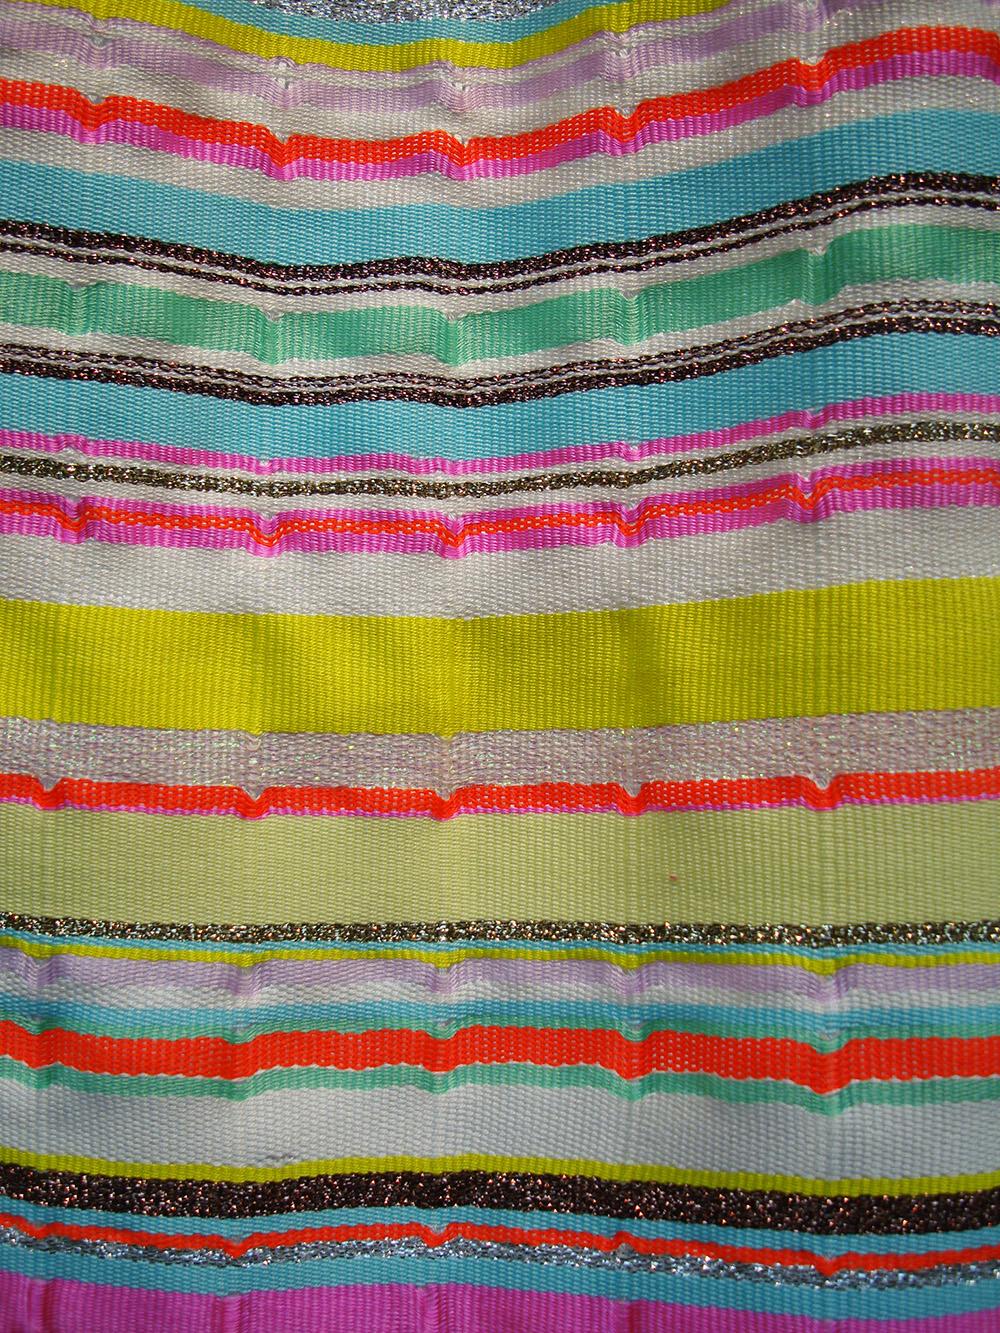 Candy stripe by Rebecca Lefevre